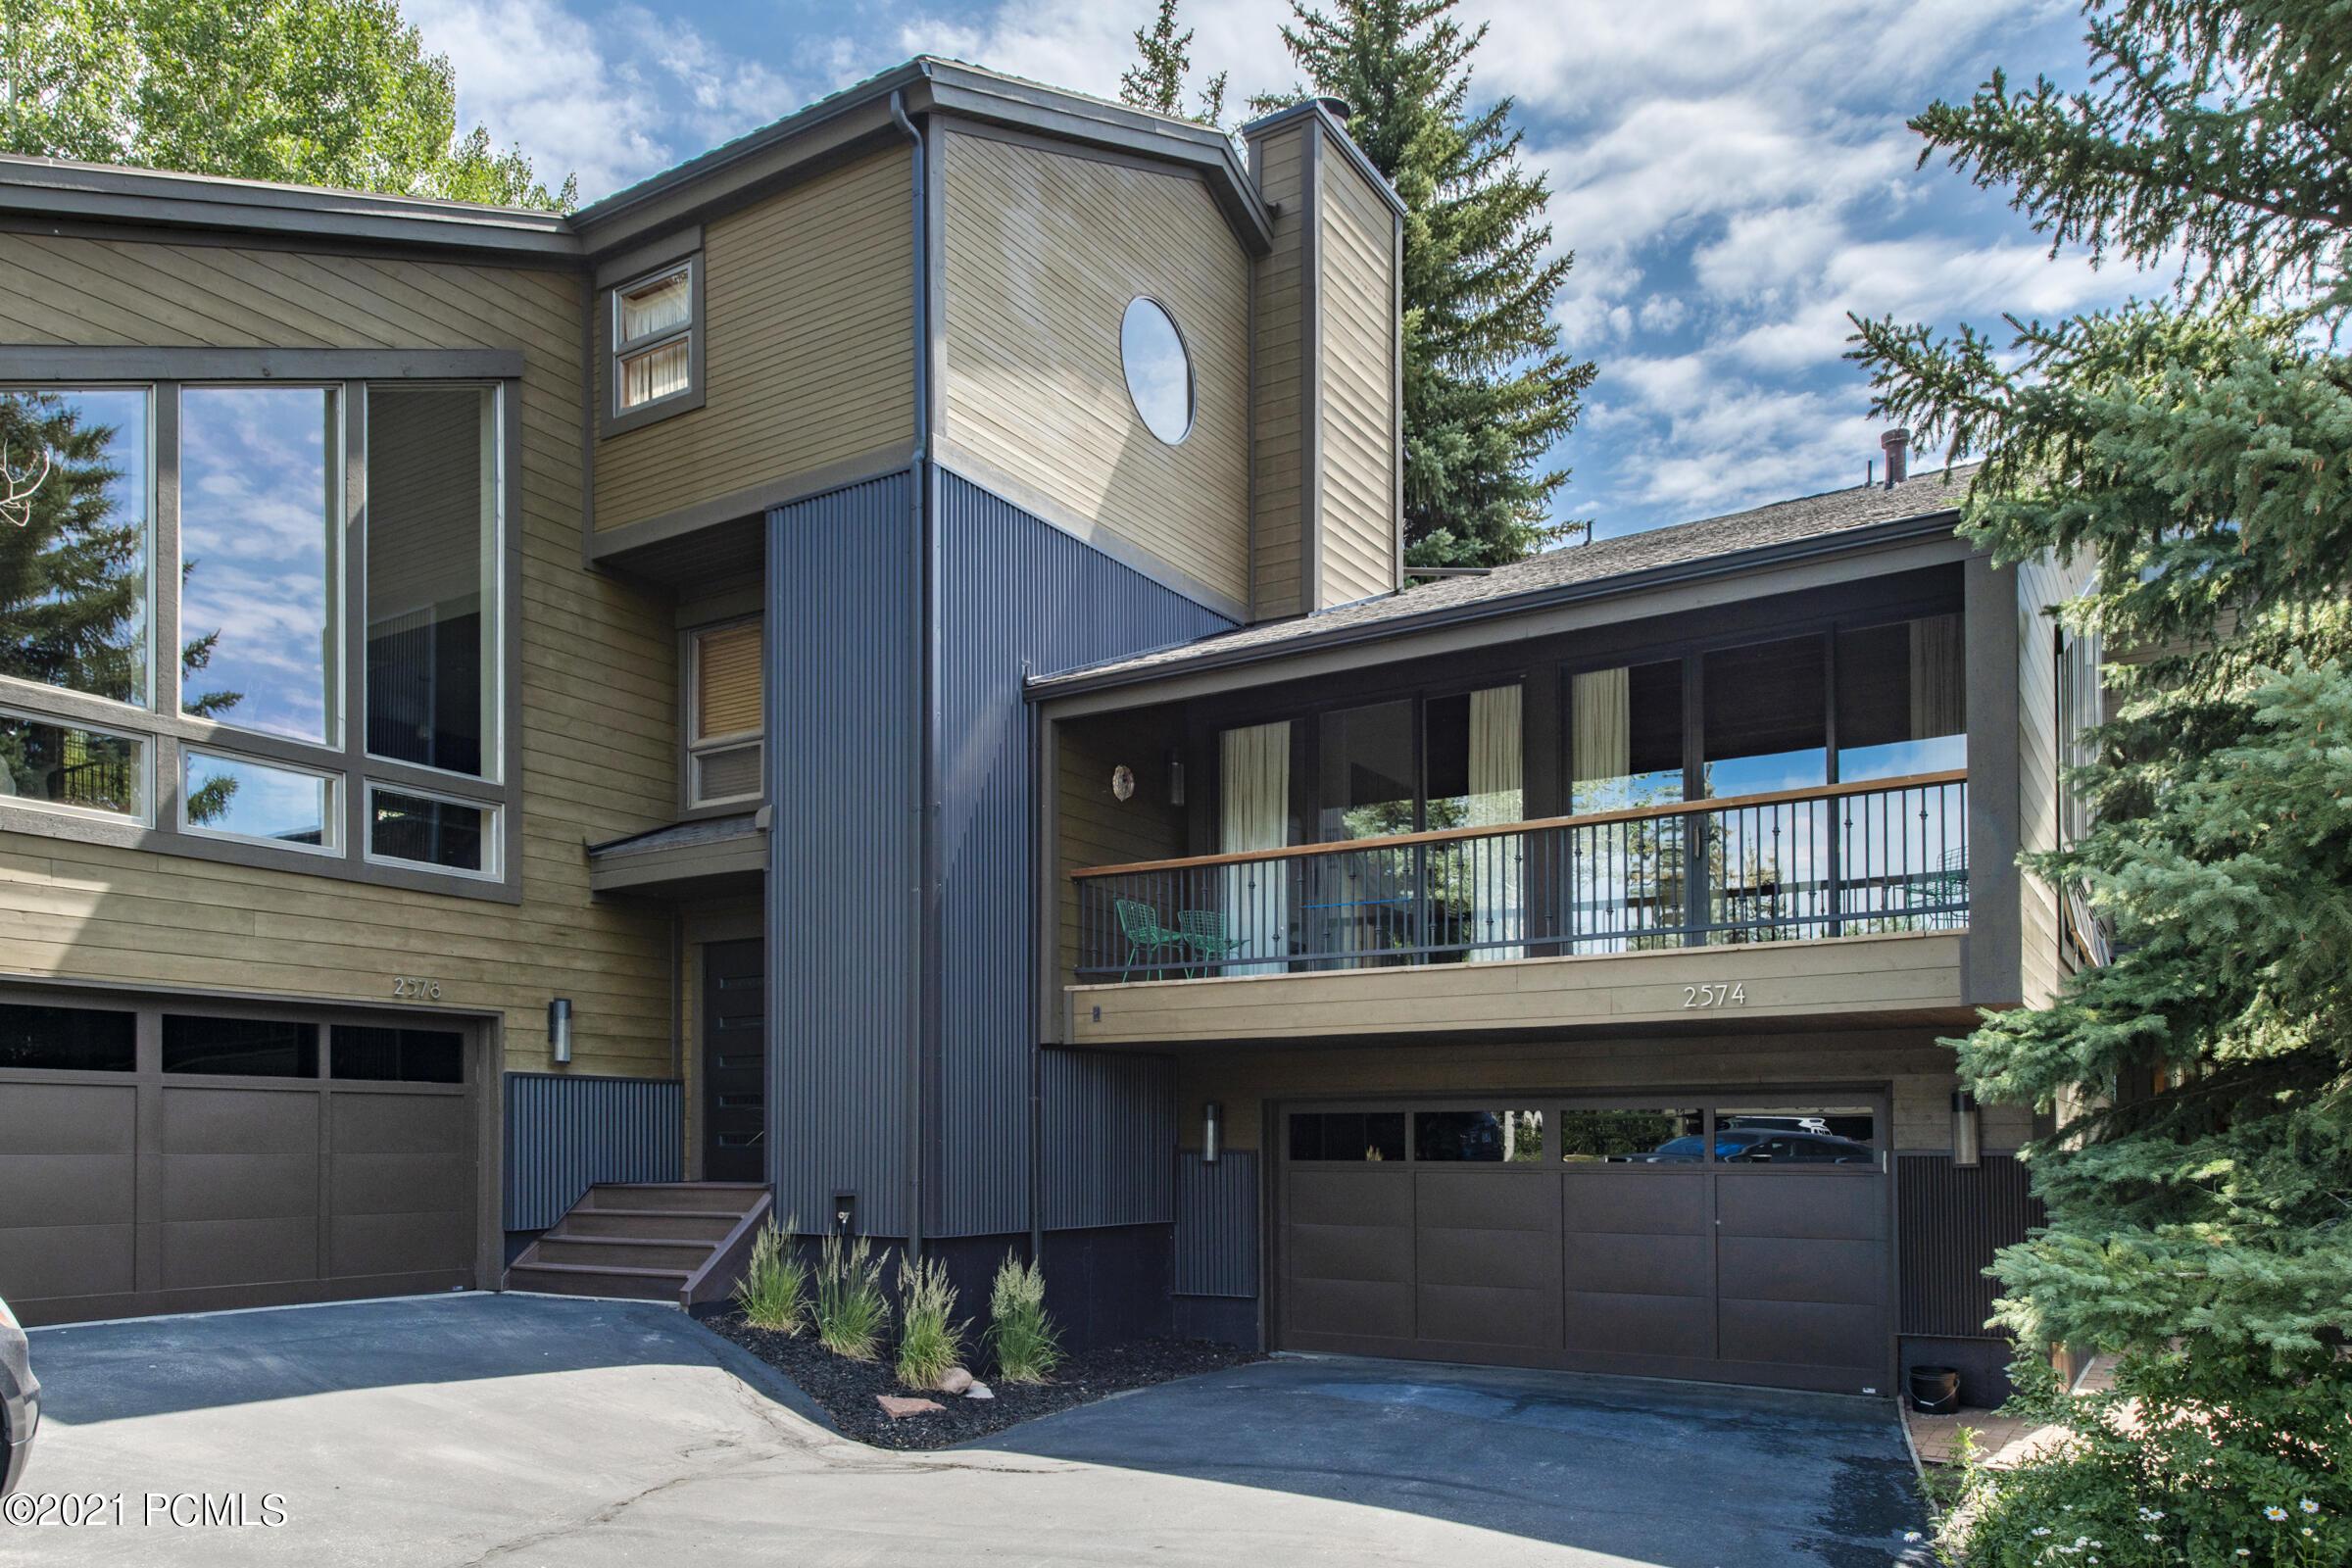 2574 Fairway Village Drive, Park City, Utah 84060, 4 Bedrooms Bedrooms, ,4 BathroomsBathrooms,Condominium,For Sale,Fairway Village,12102920